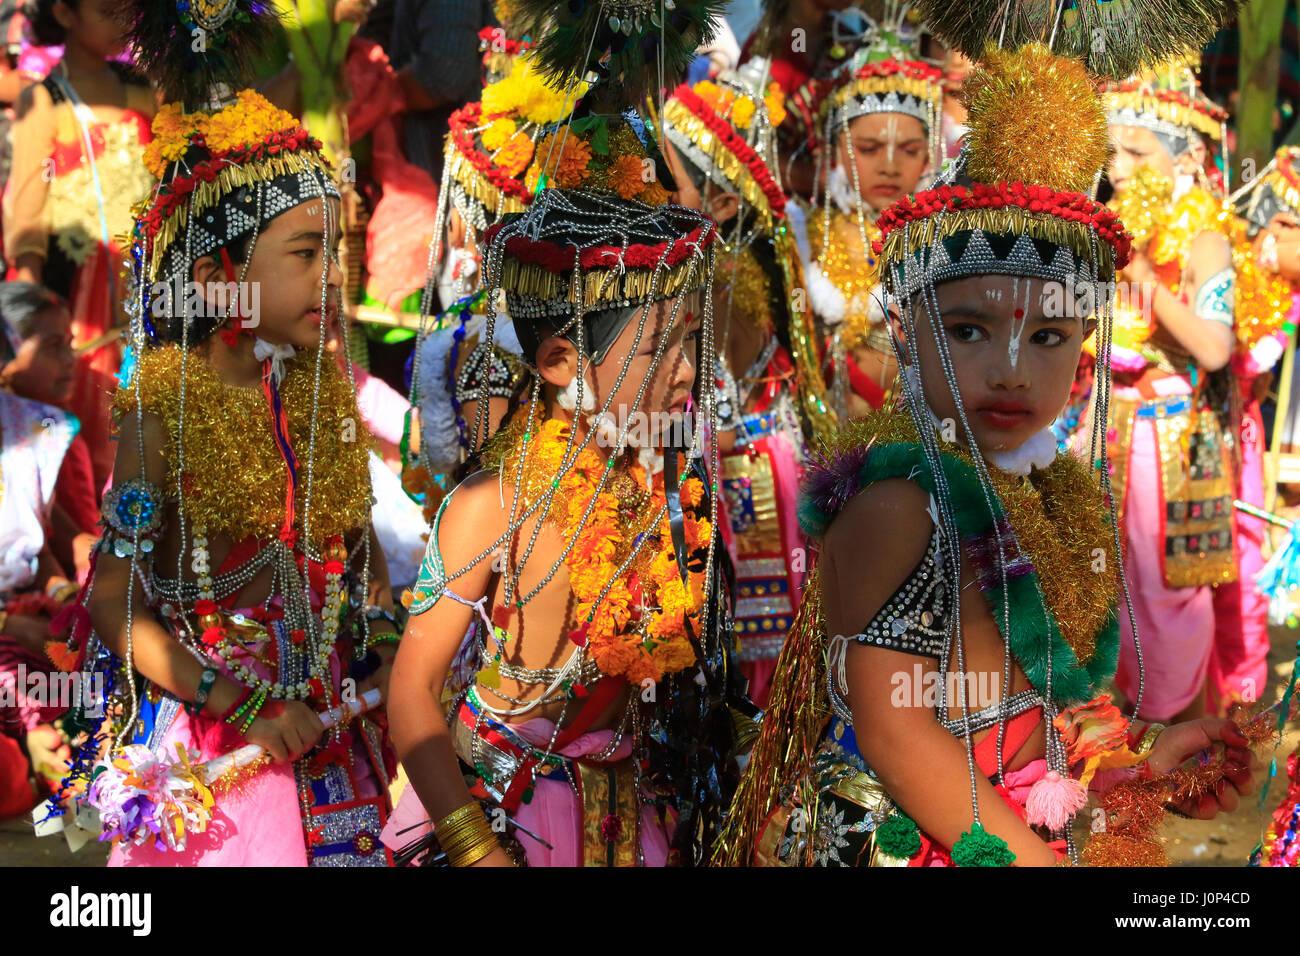 Manipuri boys perform dances during Ras Leela festival, in Madhabpur, Maulvi bazar, Bangladesh. The Bishnupriya - Stock Image